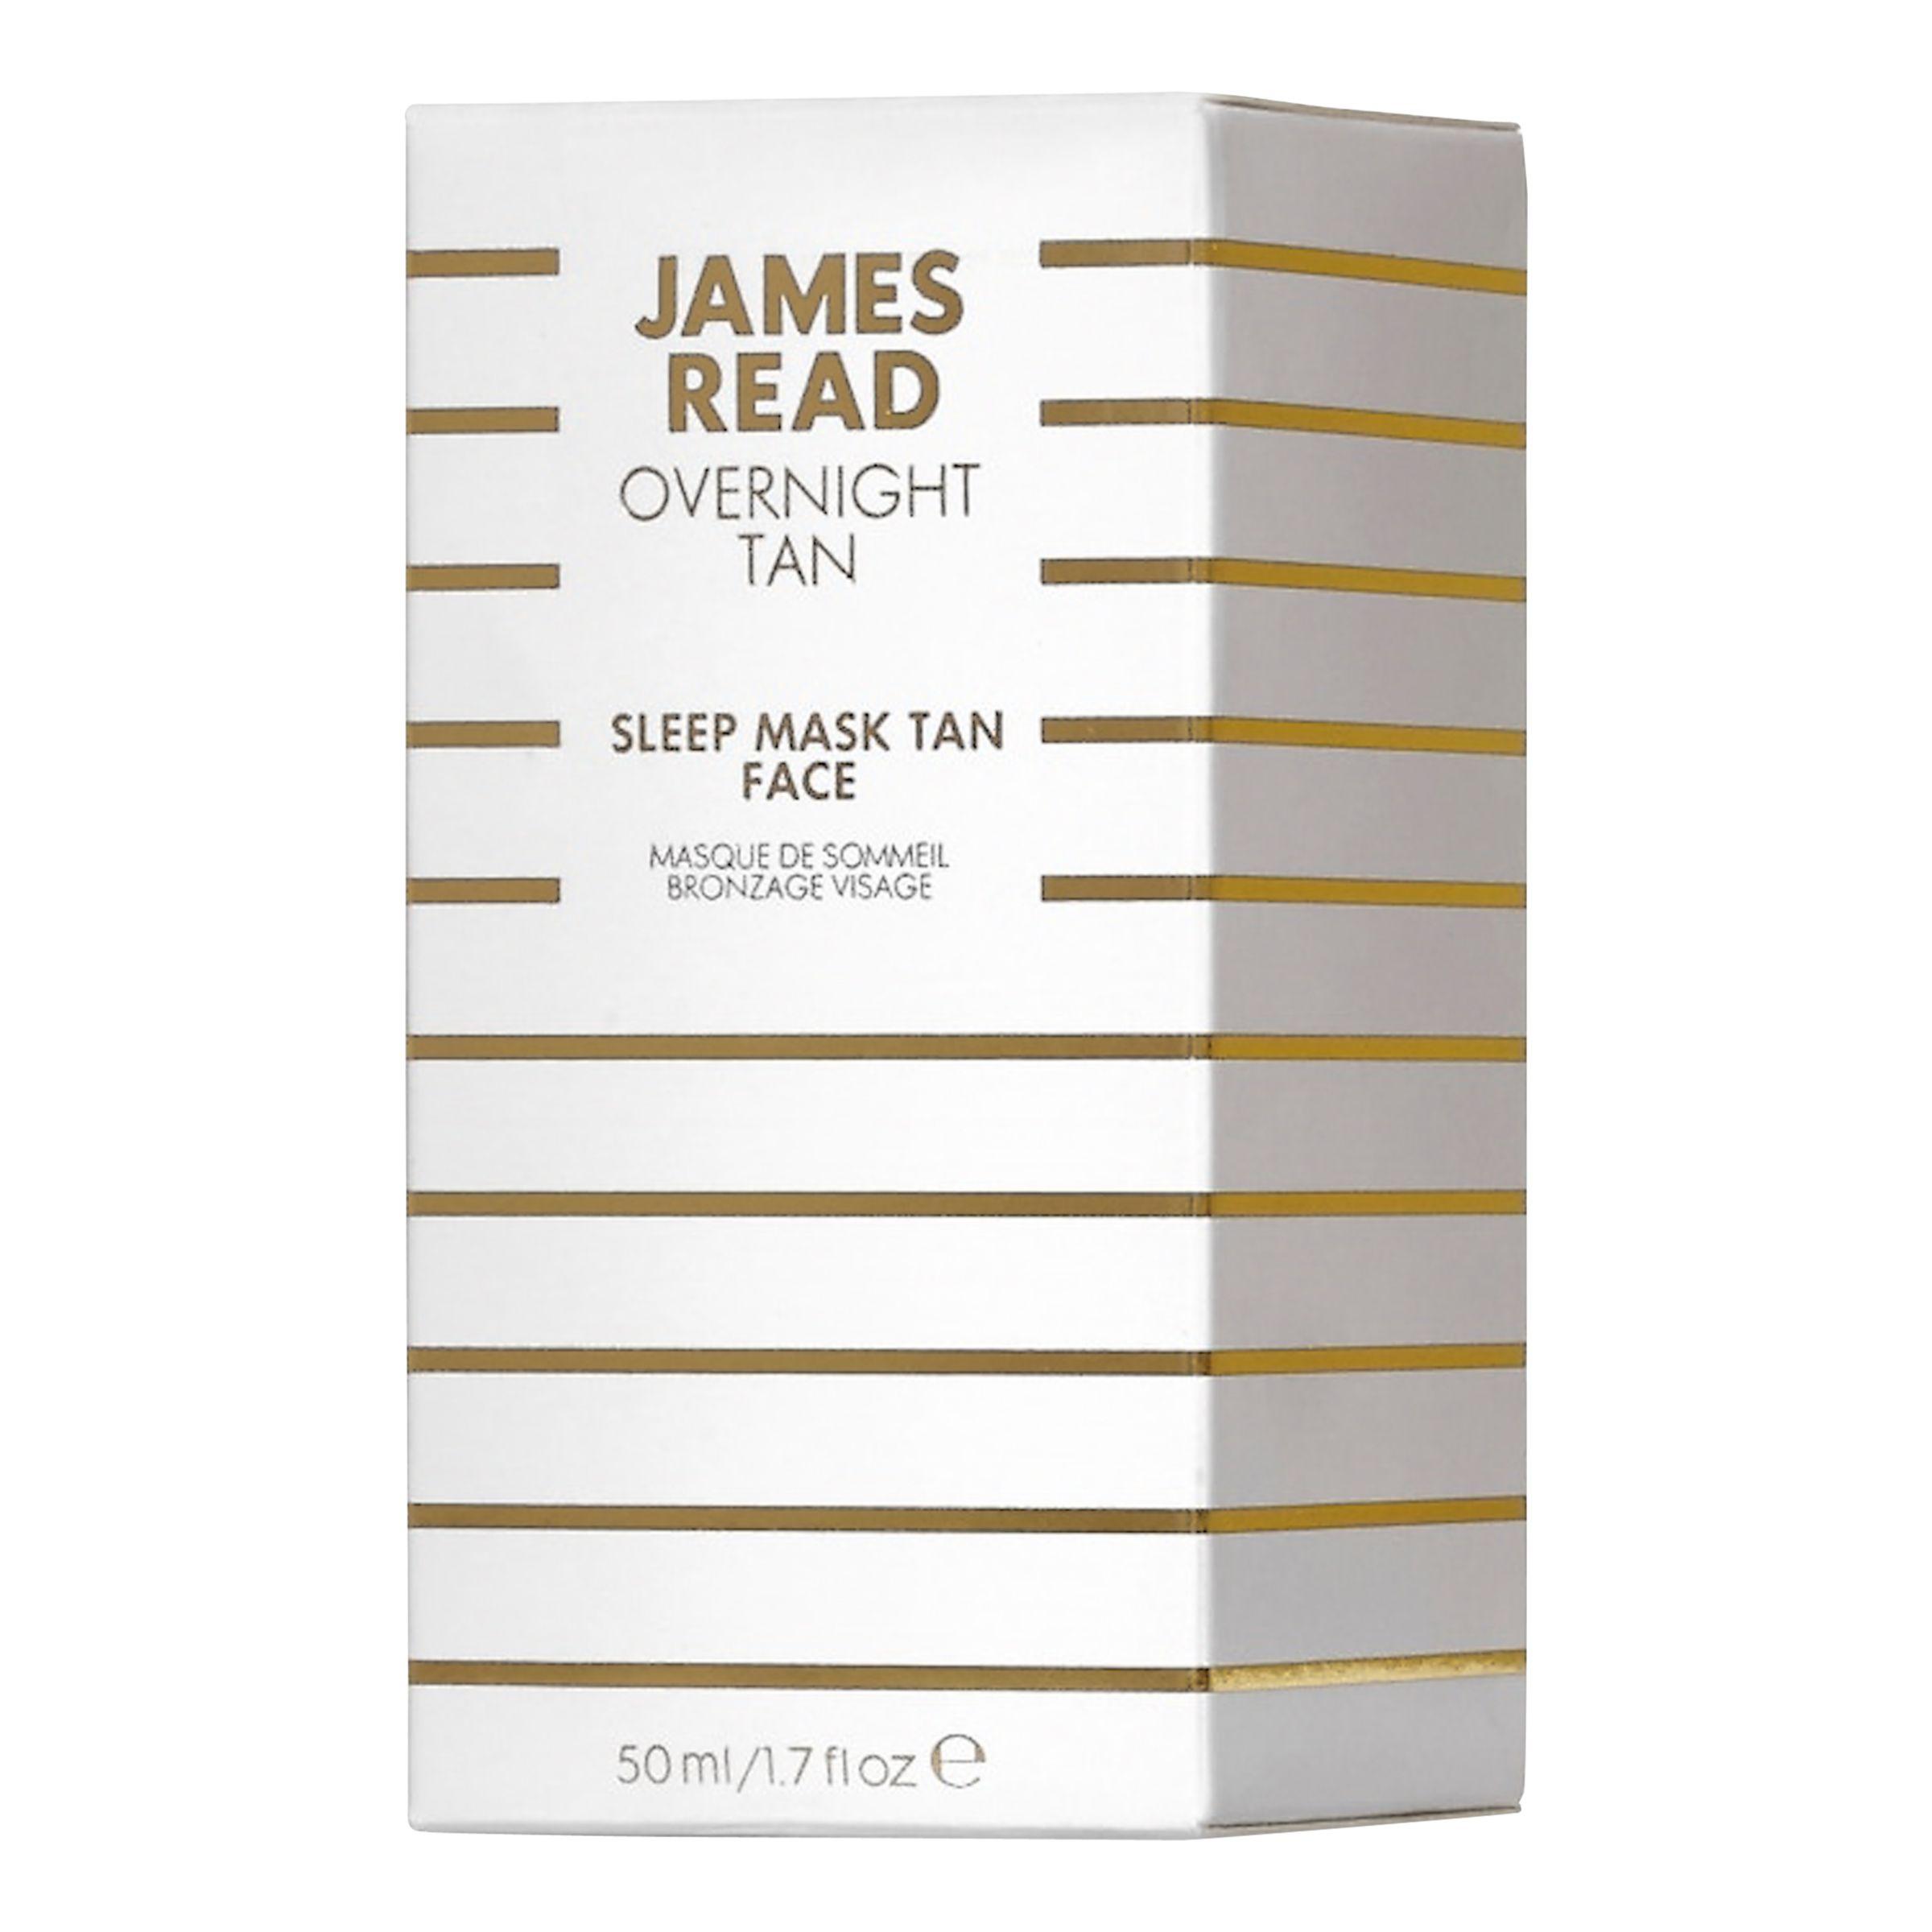 James Read James Read Overnight Tan Sleep Mask Face, 50ml